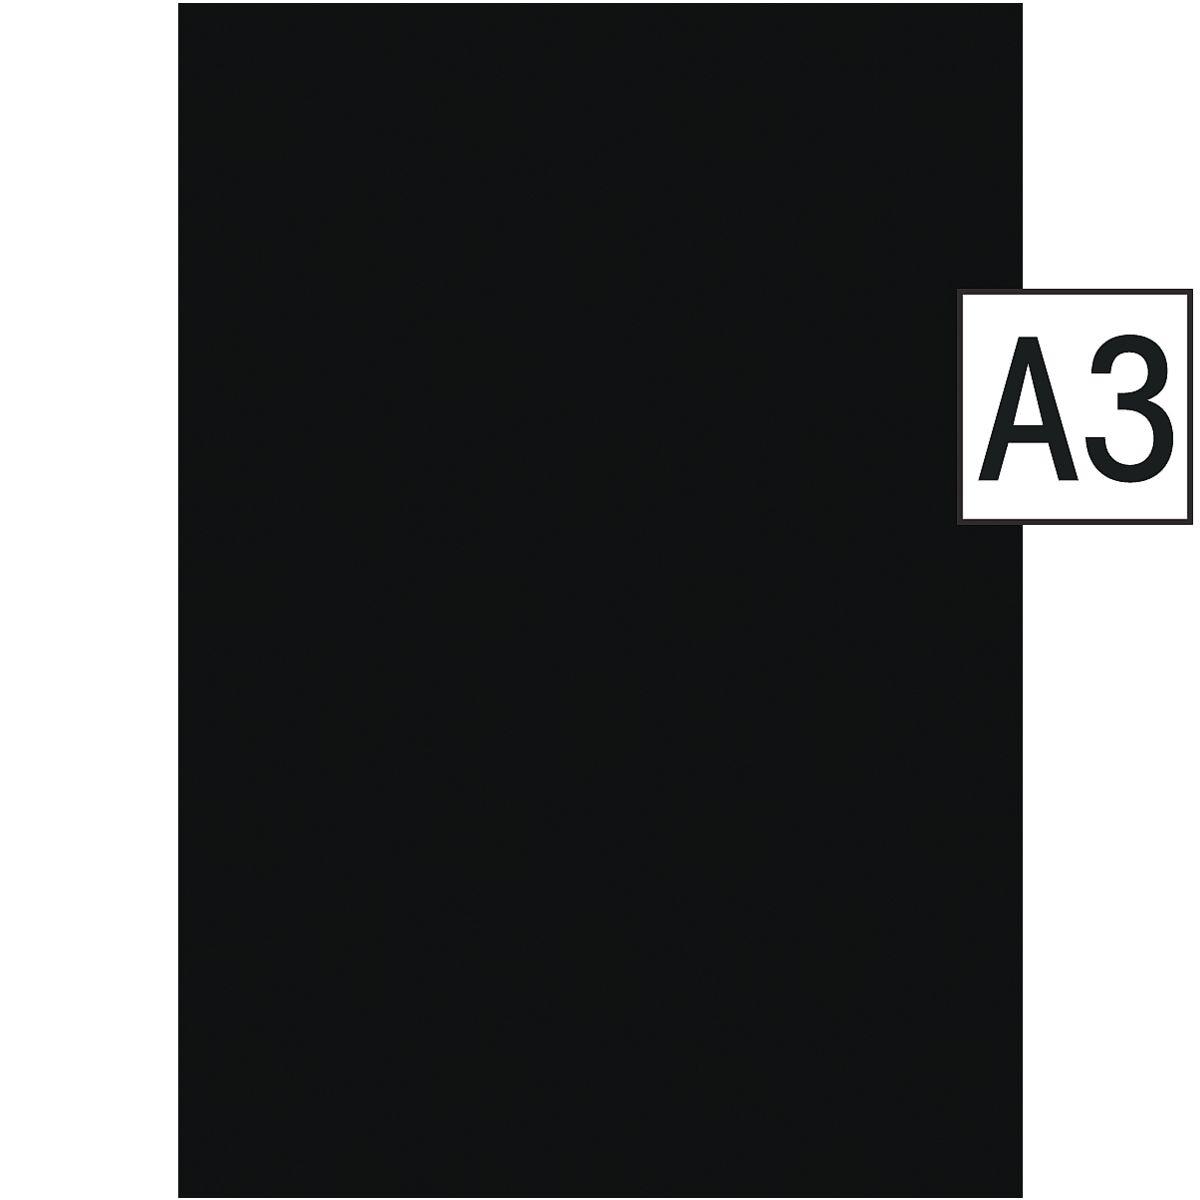 papyrus plakatkarton bei otto office g nstig kaufen. Black Bedroom Furniture Sets. Home Design Ideas